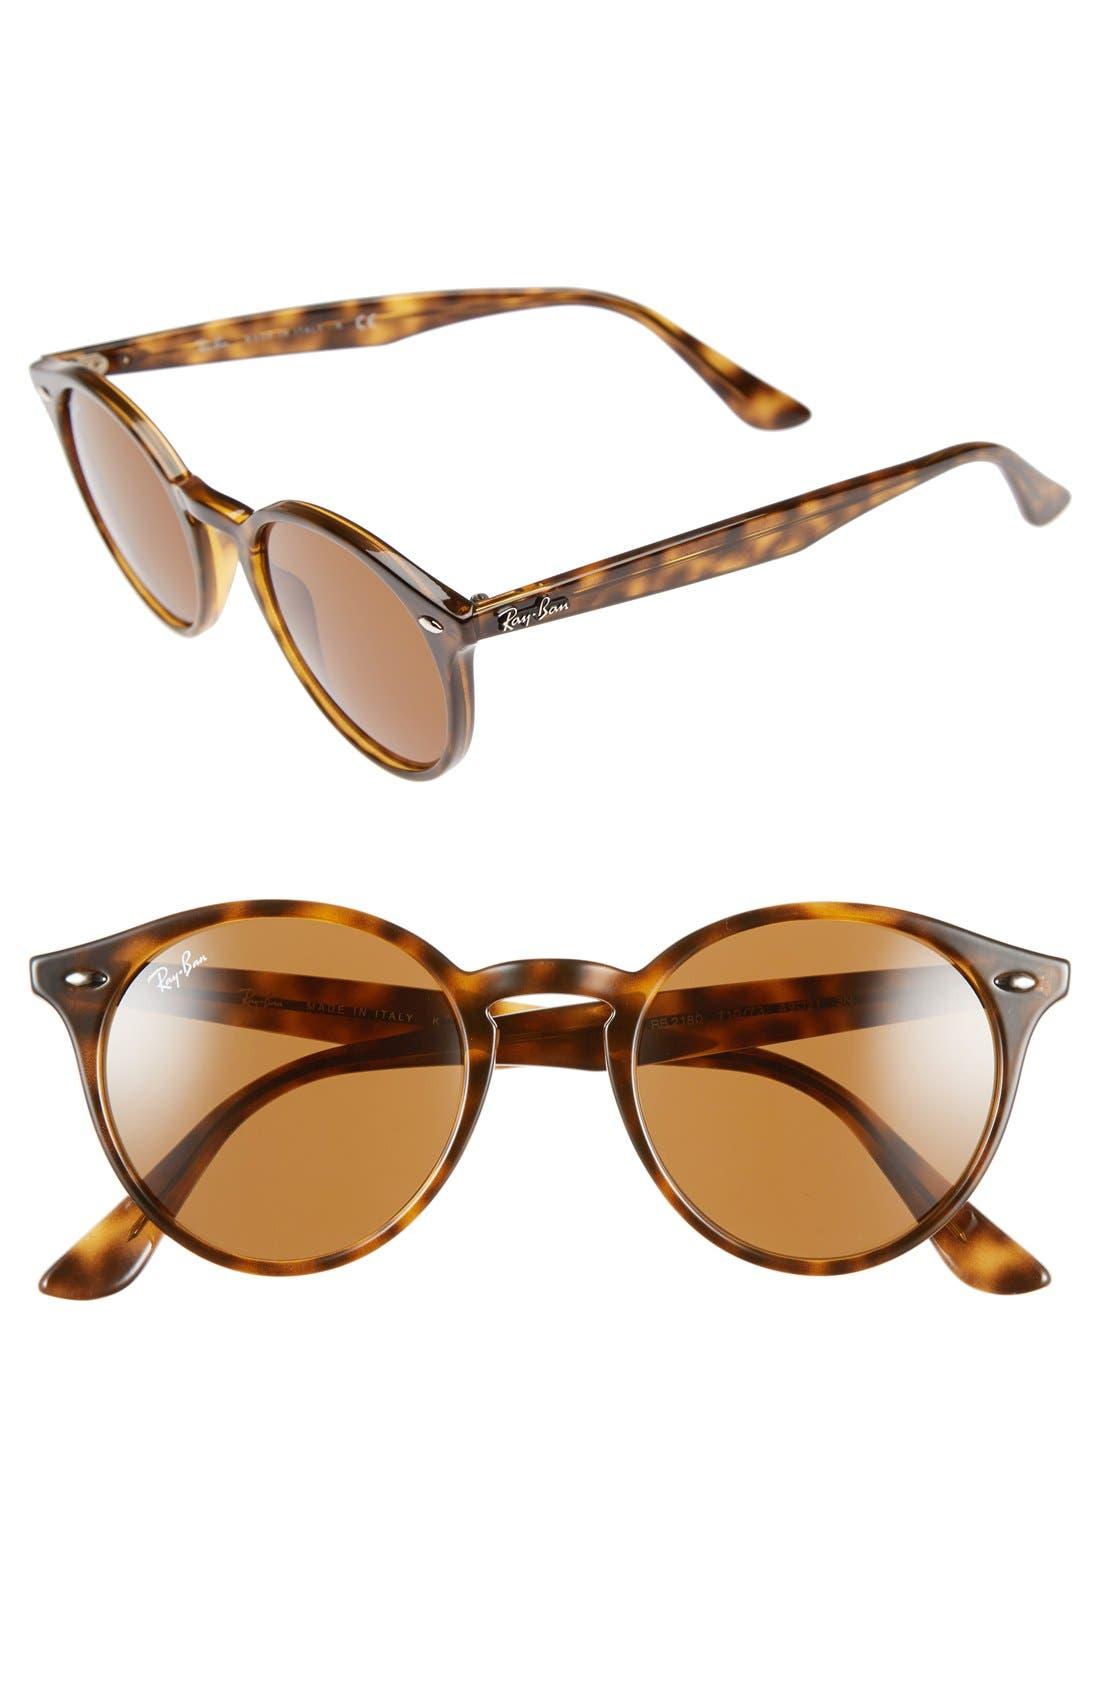 49mm Round Sunglasses,                         Main,                         color, 206